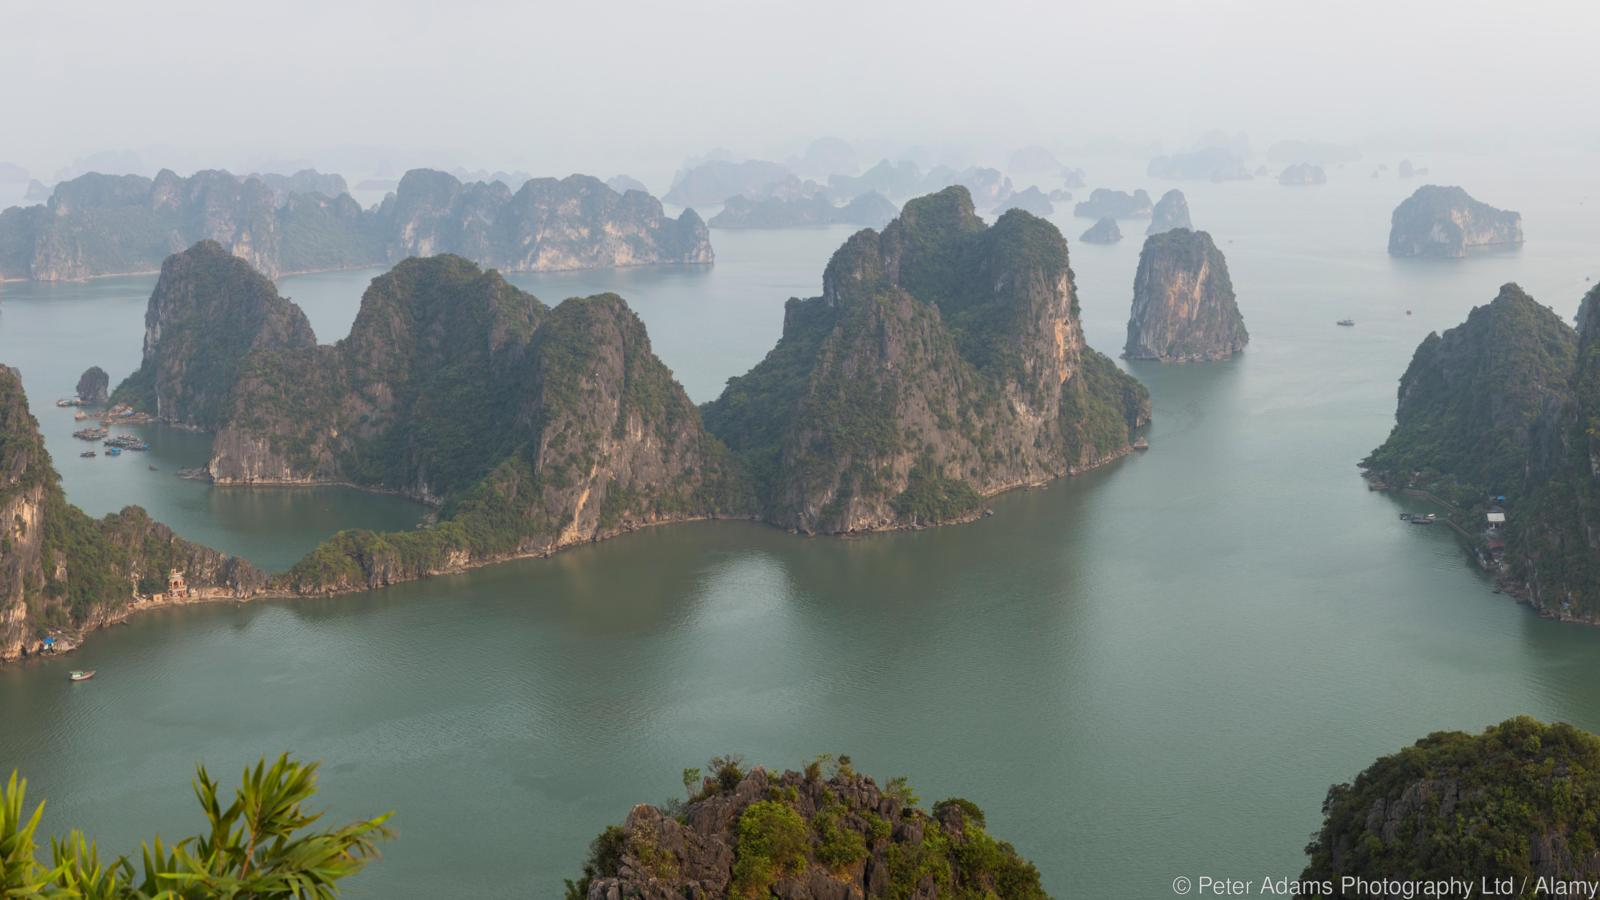 E64AC0 View over misty Ha Long Bay, north Vietnam